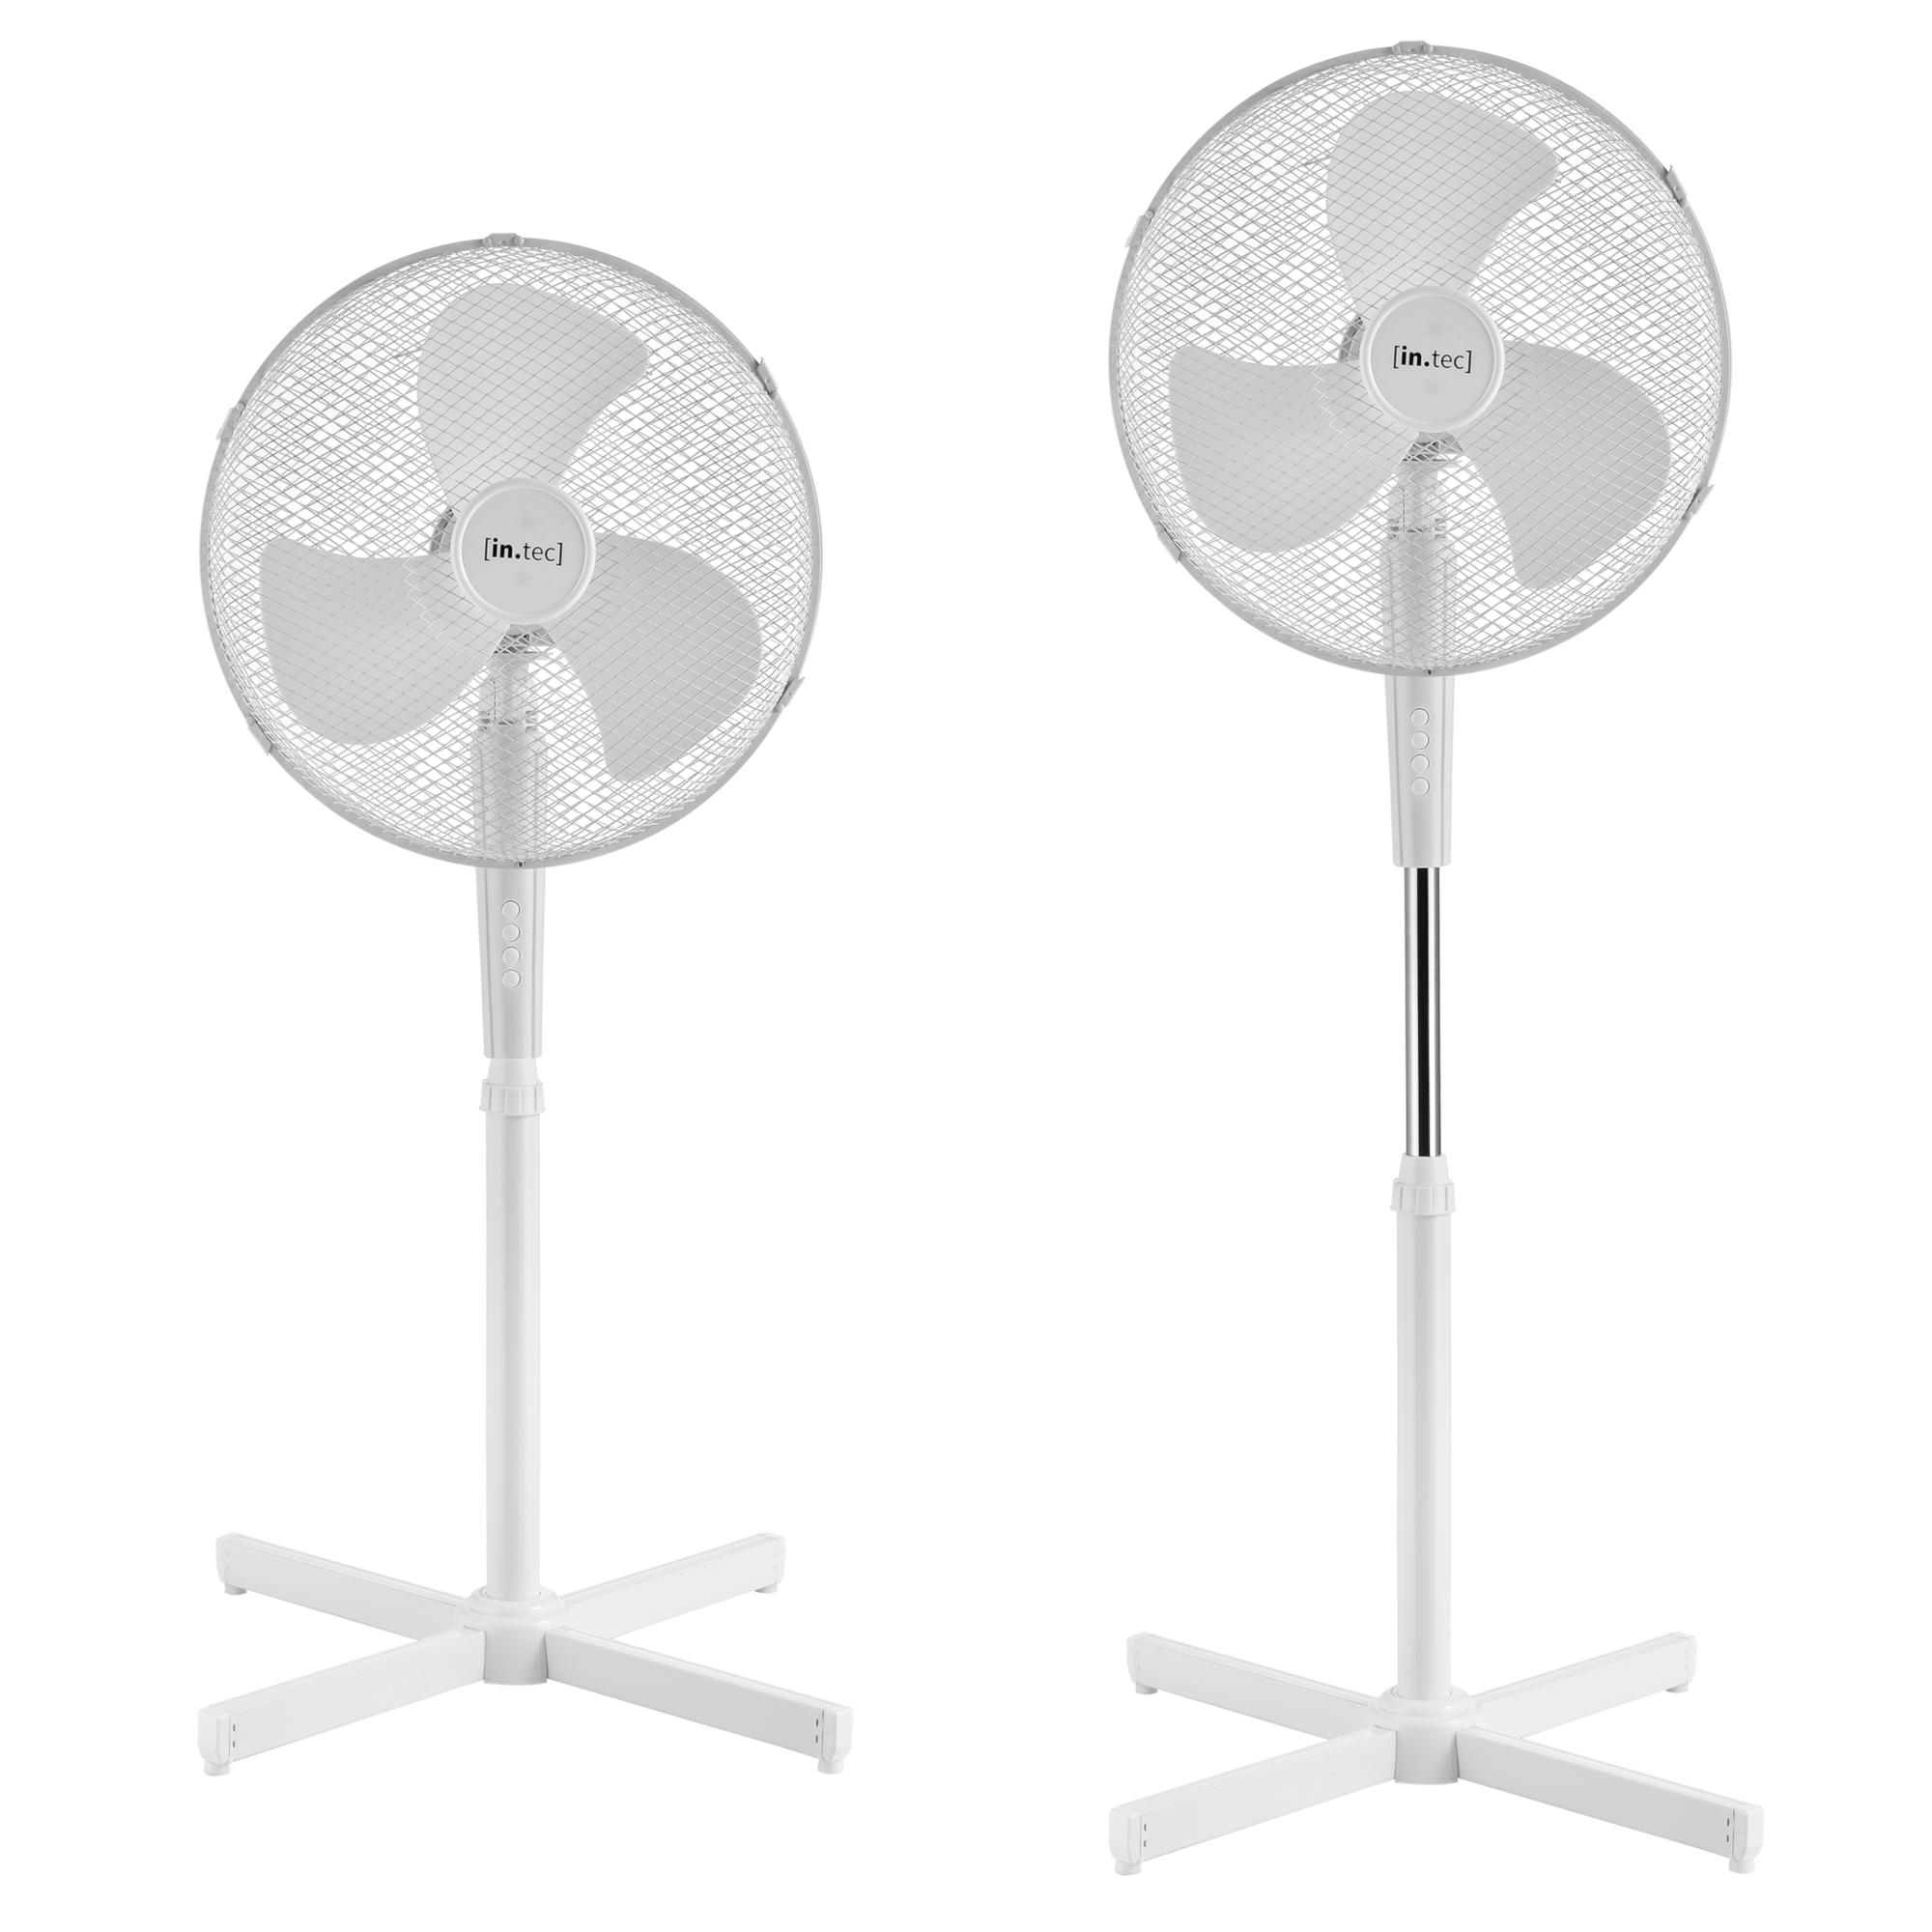 Standventilator 45W Luftkühler Ventilator Lüfter Oszillierend Weiß